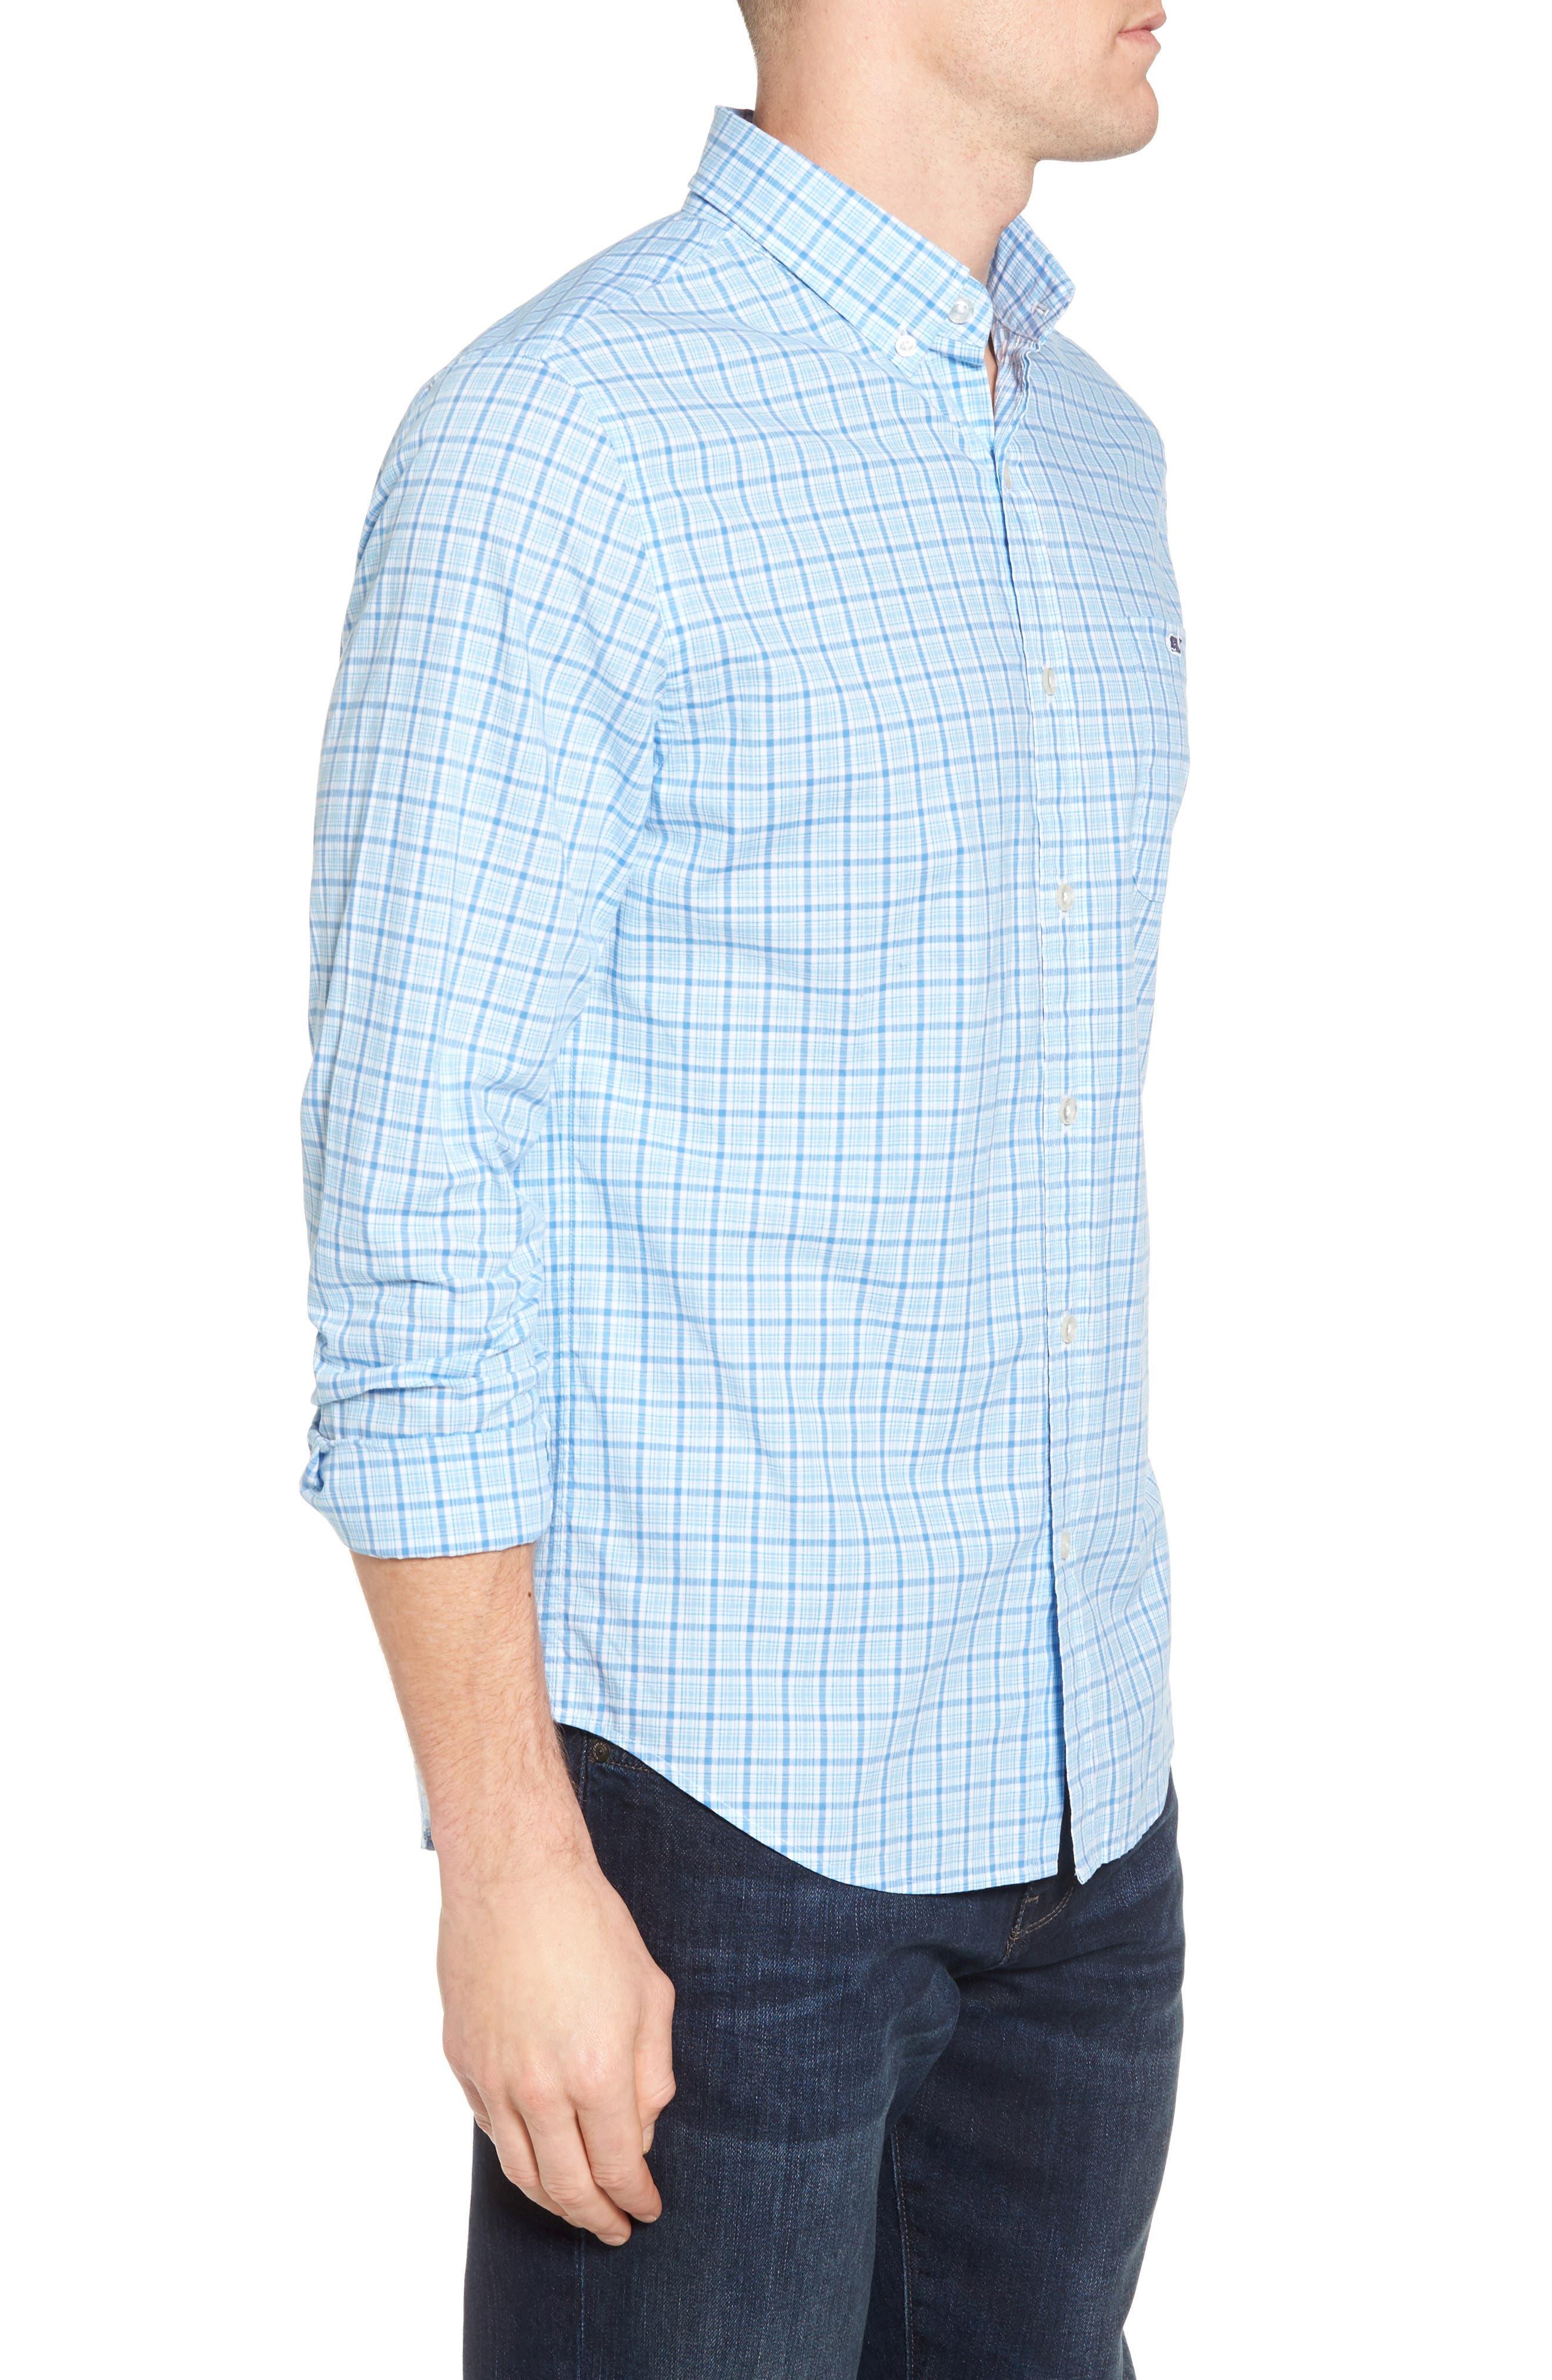 Seawatch Slim Fit Plaid Sport Shirt,                             Alternate thumbnail 3, color,                             459